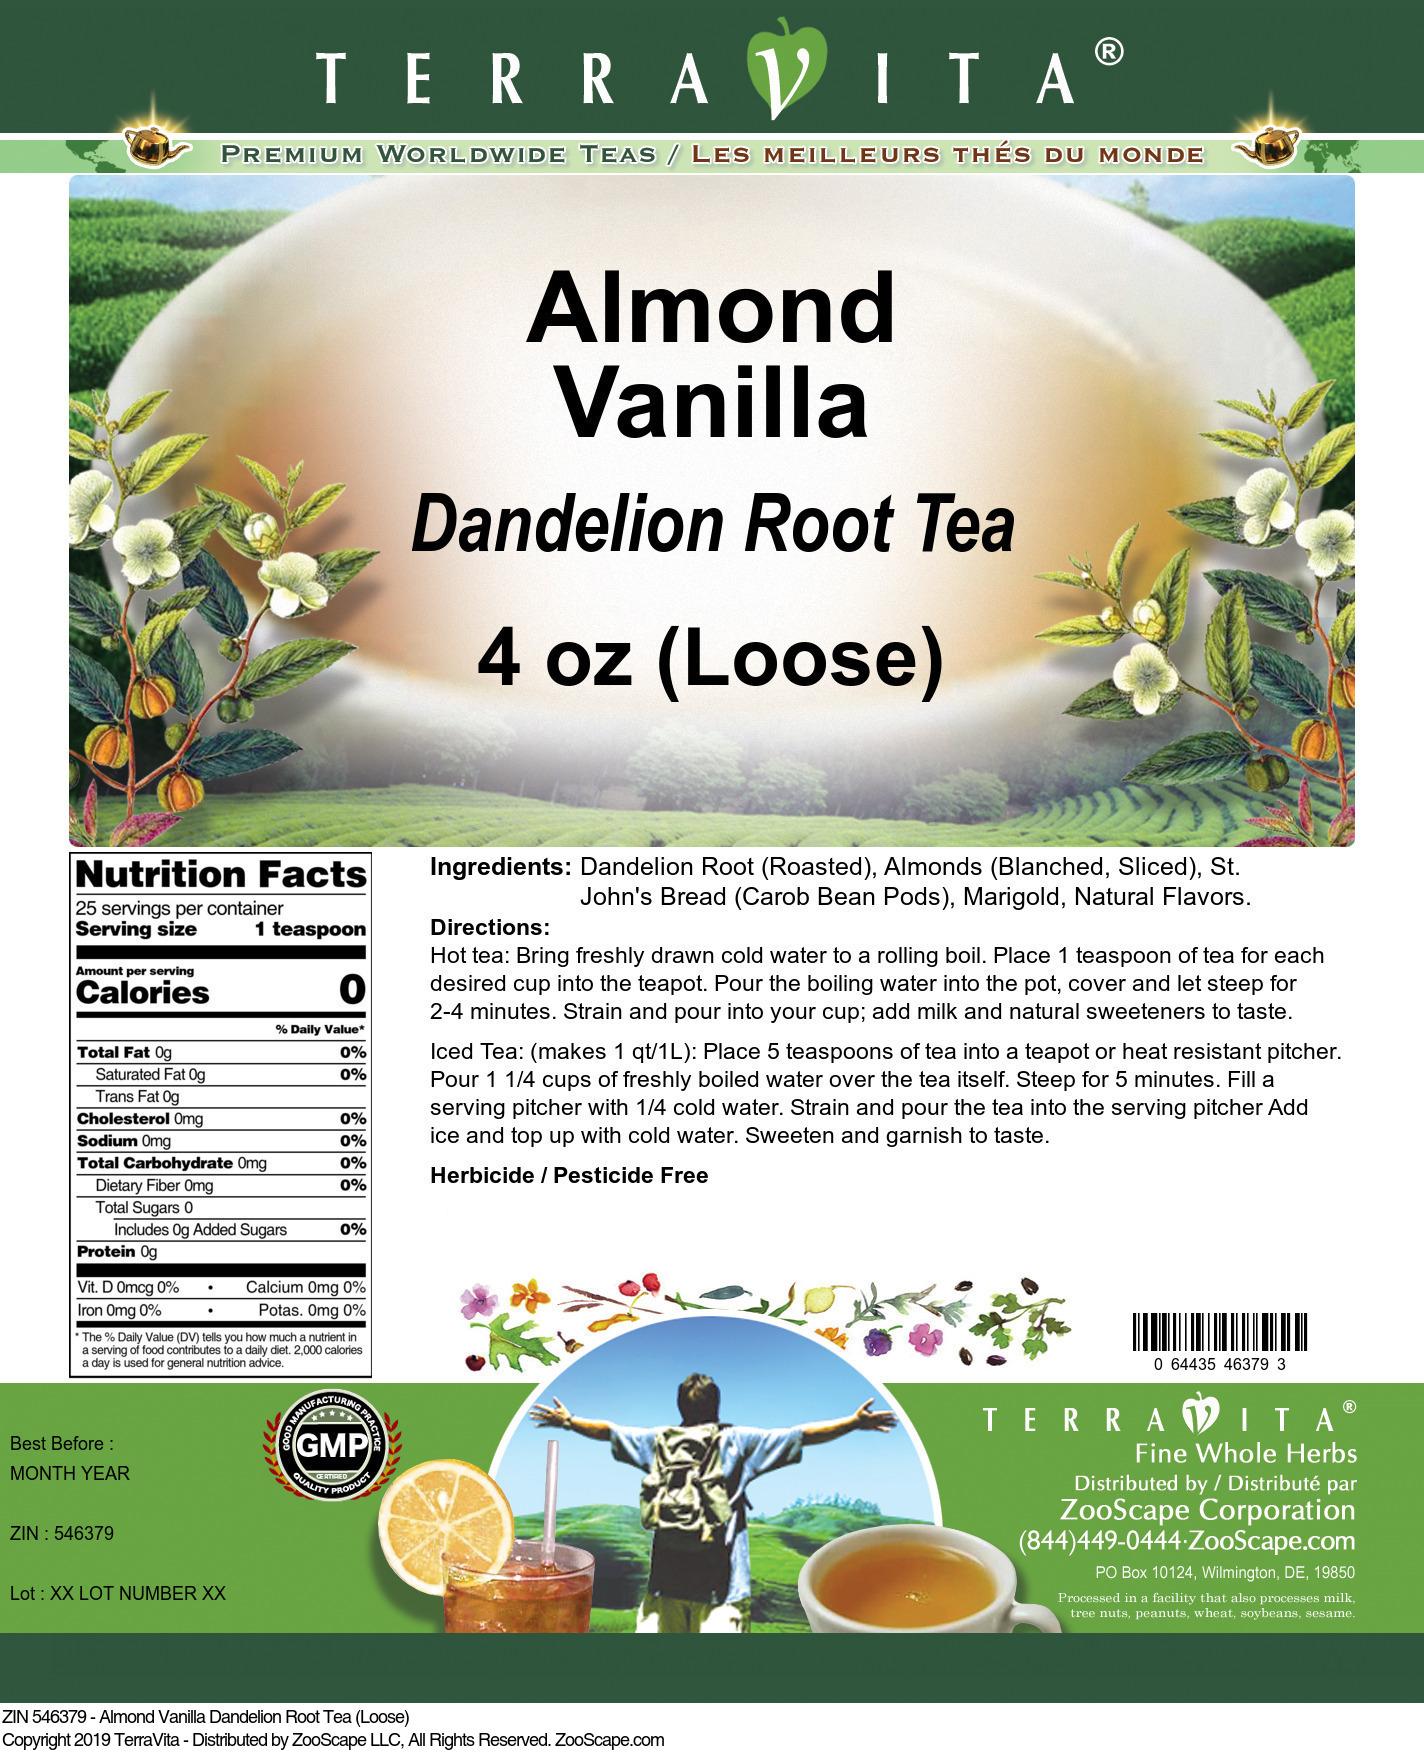 Almond Vanilla Dandelion Root